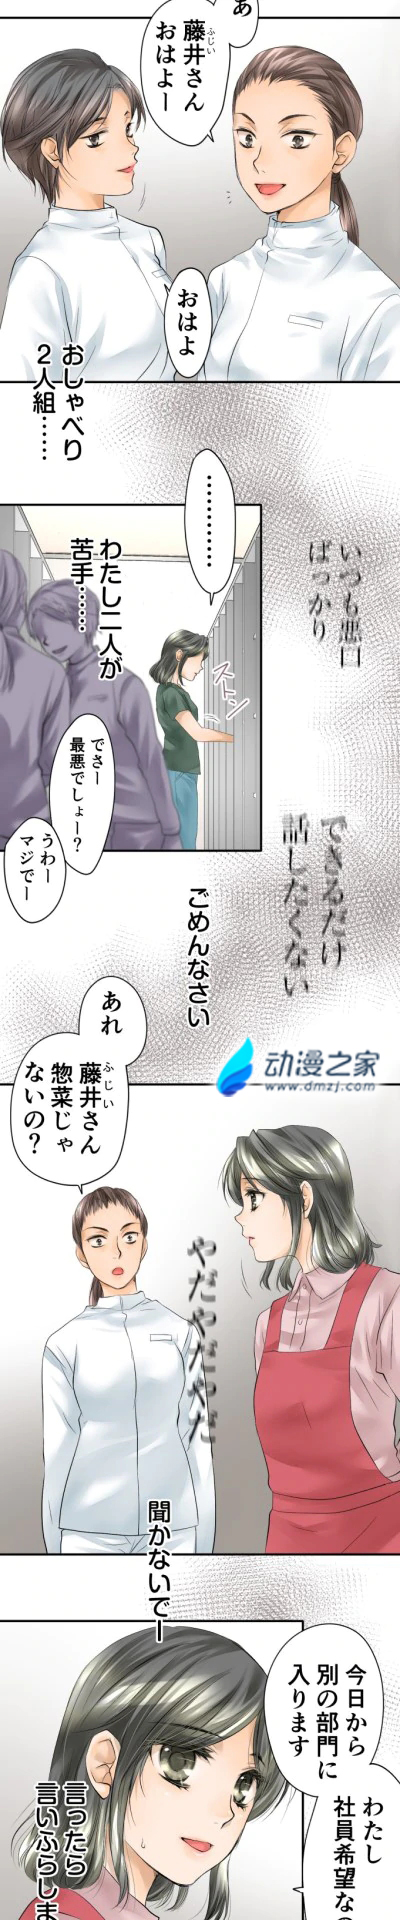 bokufuta_02.webp.jpg